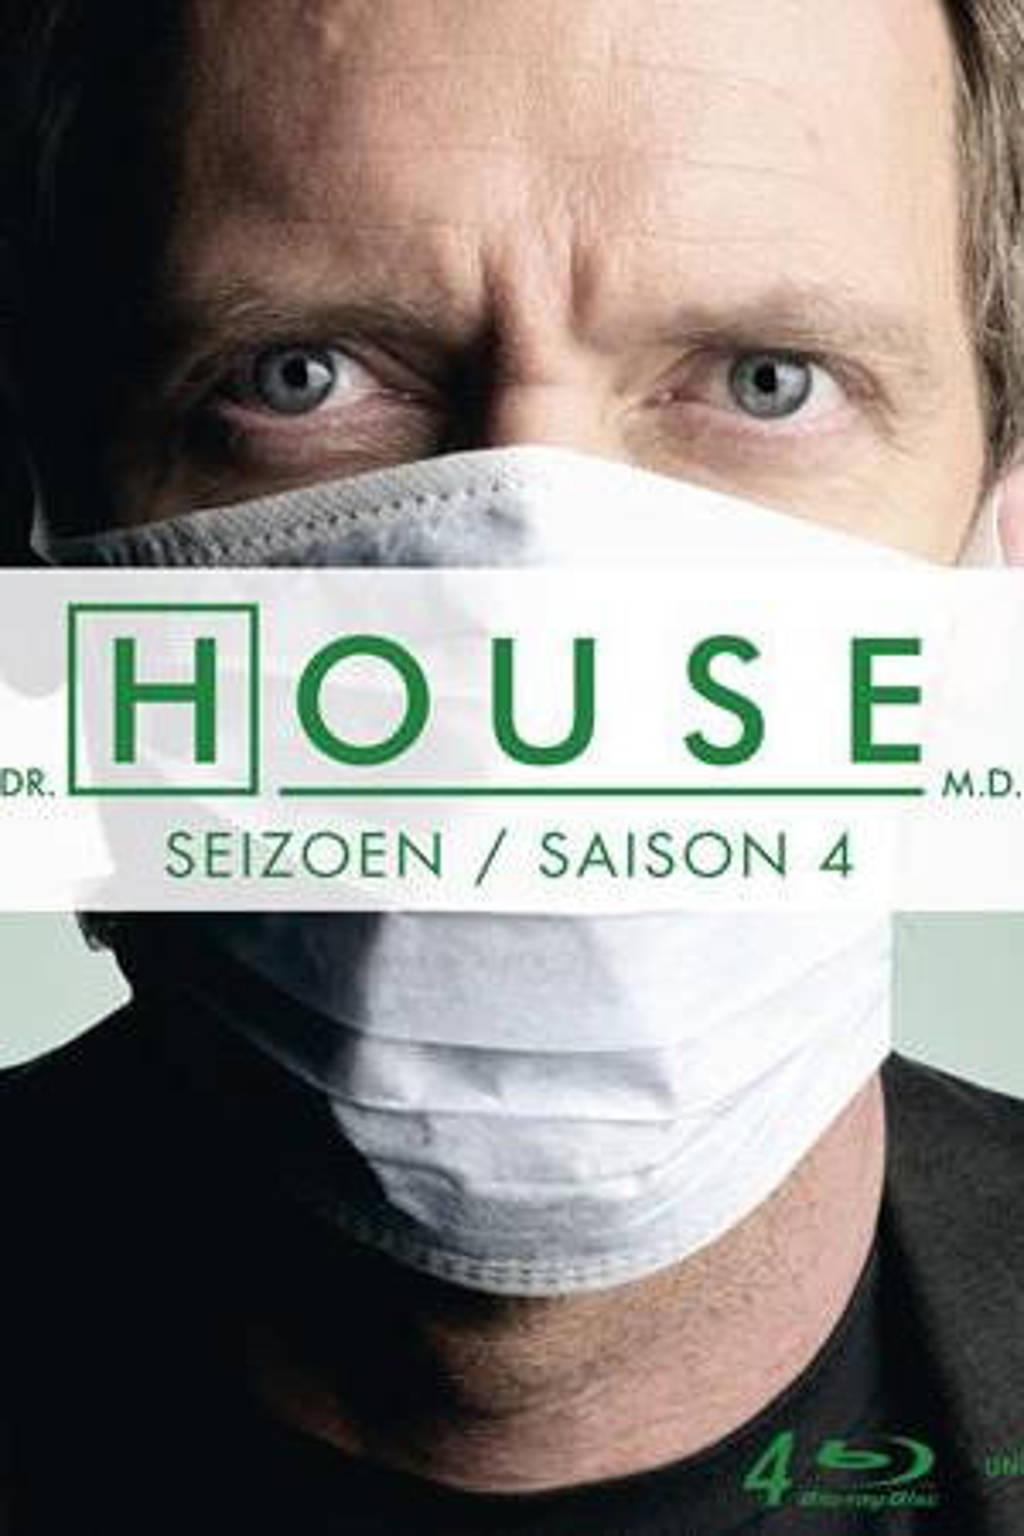 House M.D. - Seizoen 4 (Blu-ray)